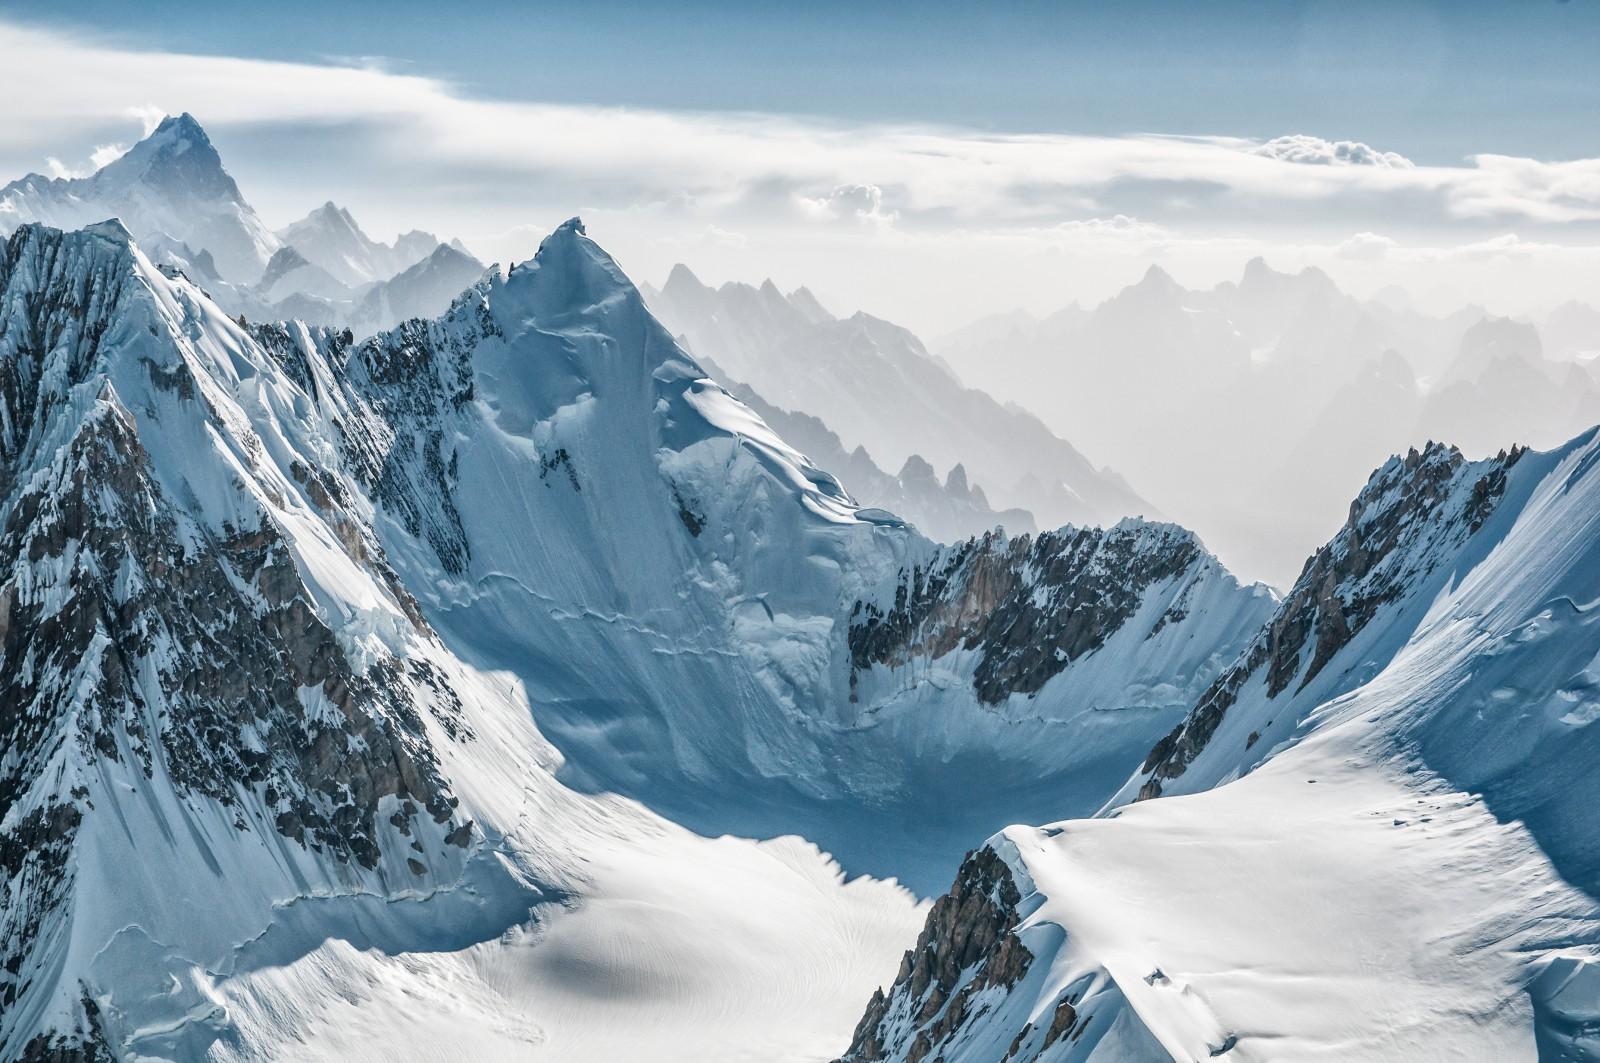 Khunyang Chhish peak